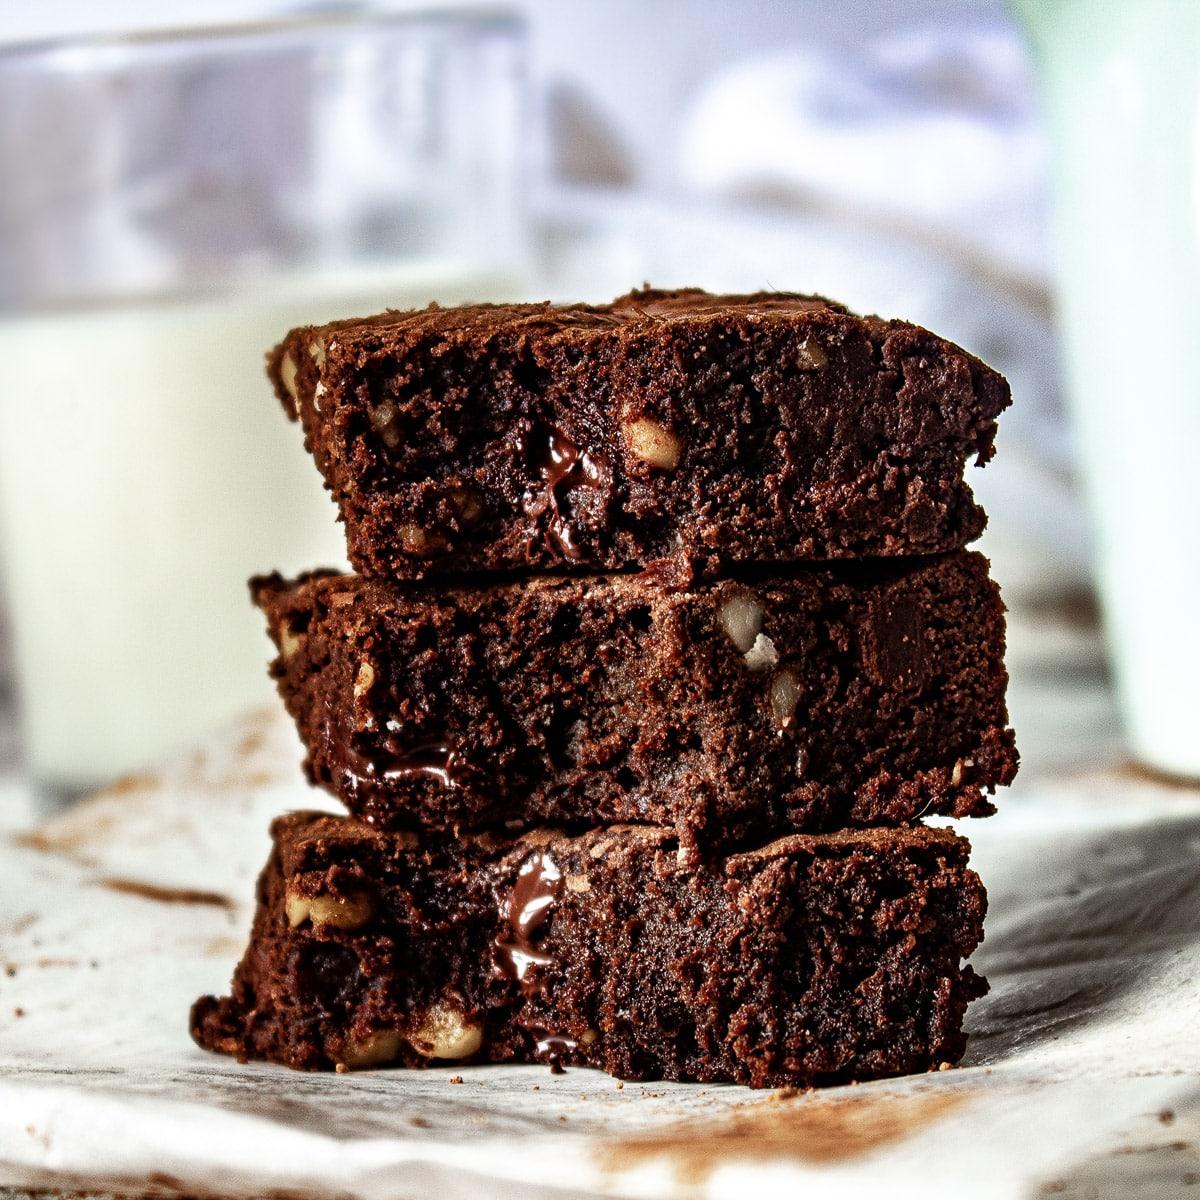 stack of chocolate walnut brownies